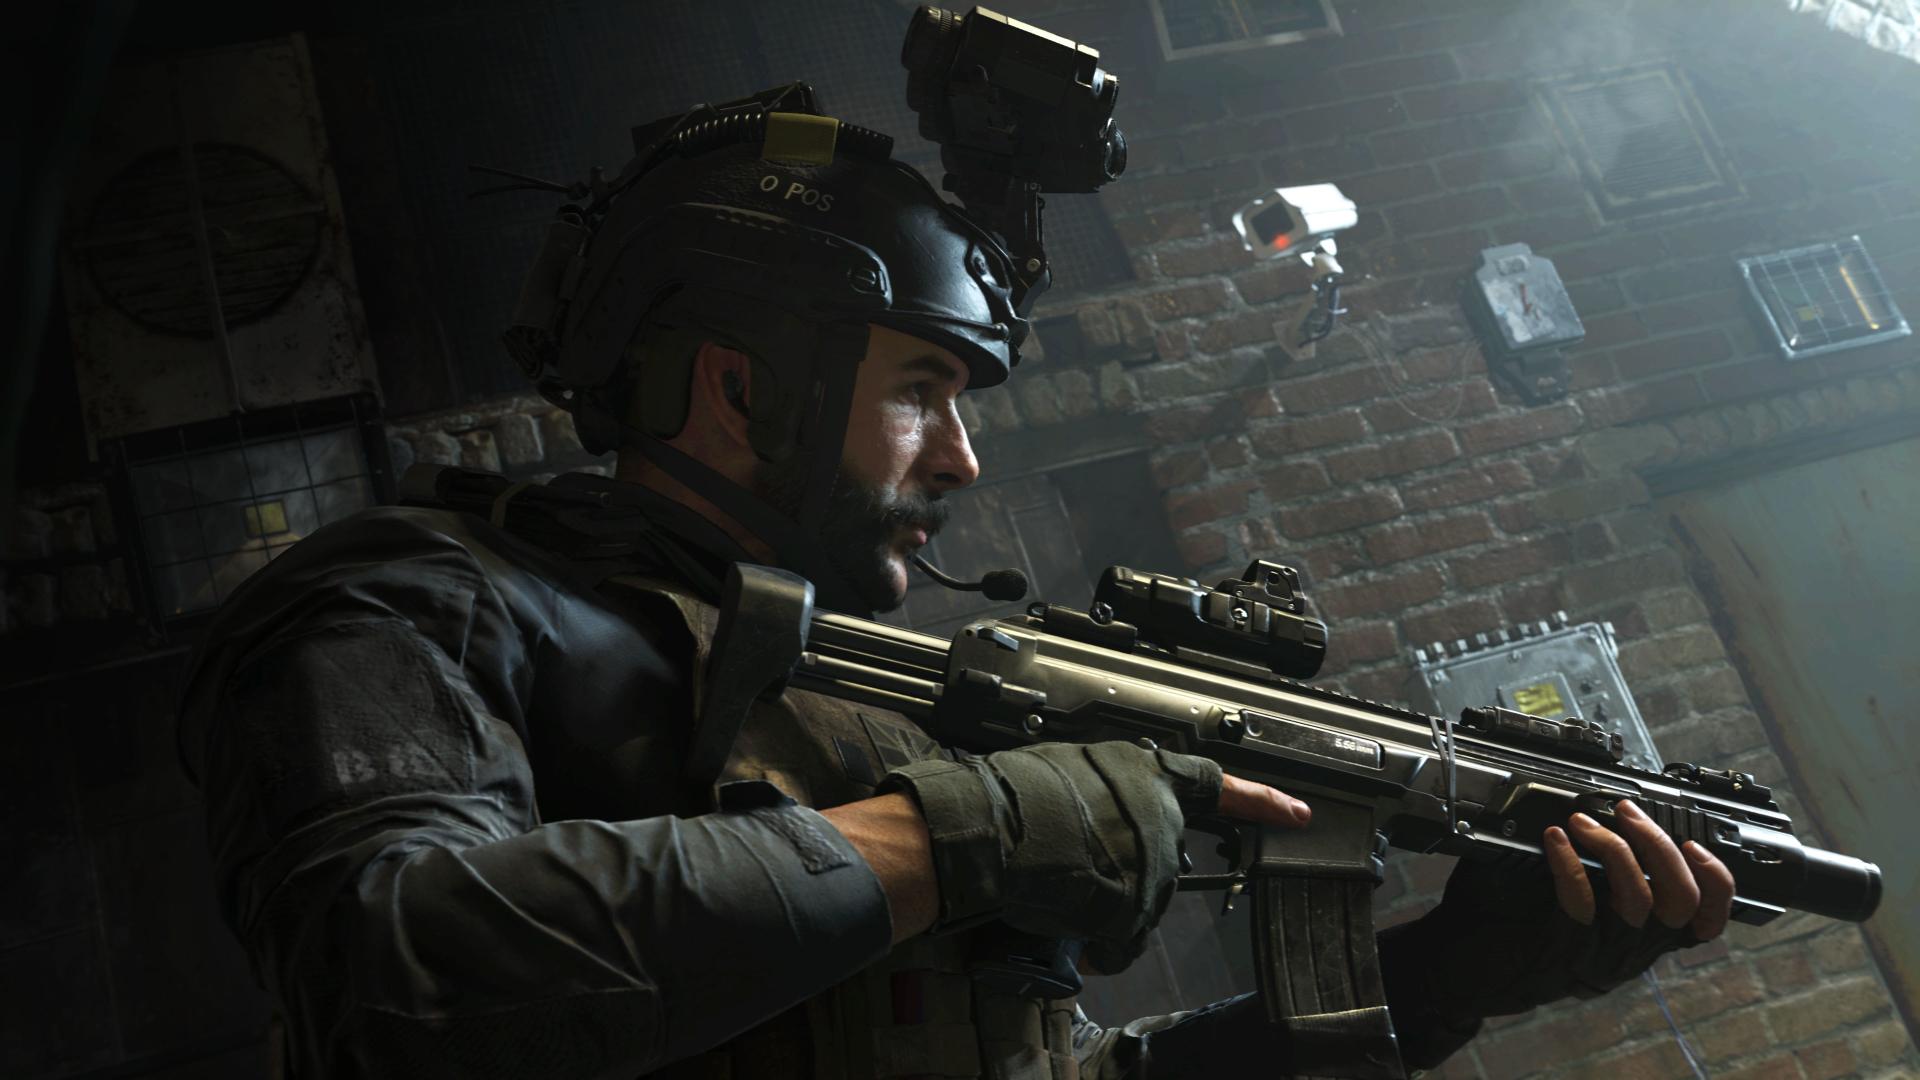 1920x1080 Call Of Duty Modern Warfare Game 2019 1080p Laptop Full